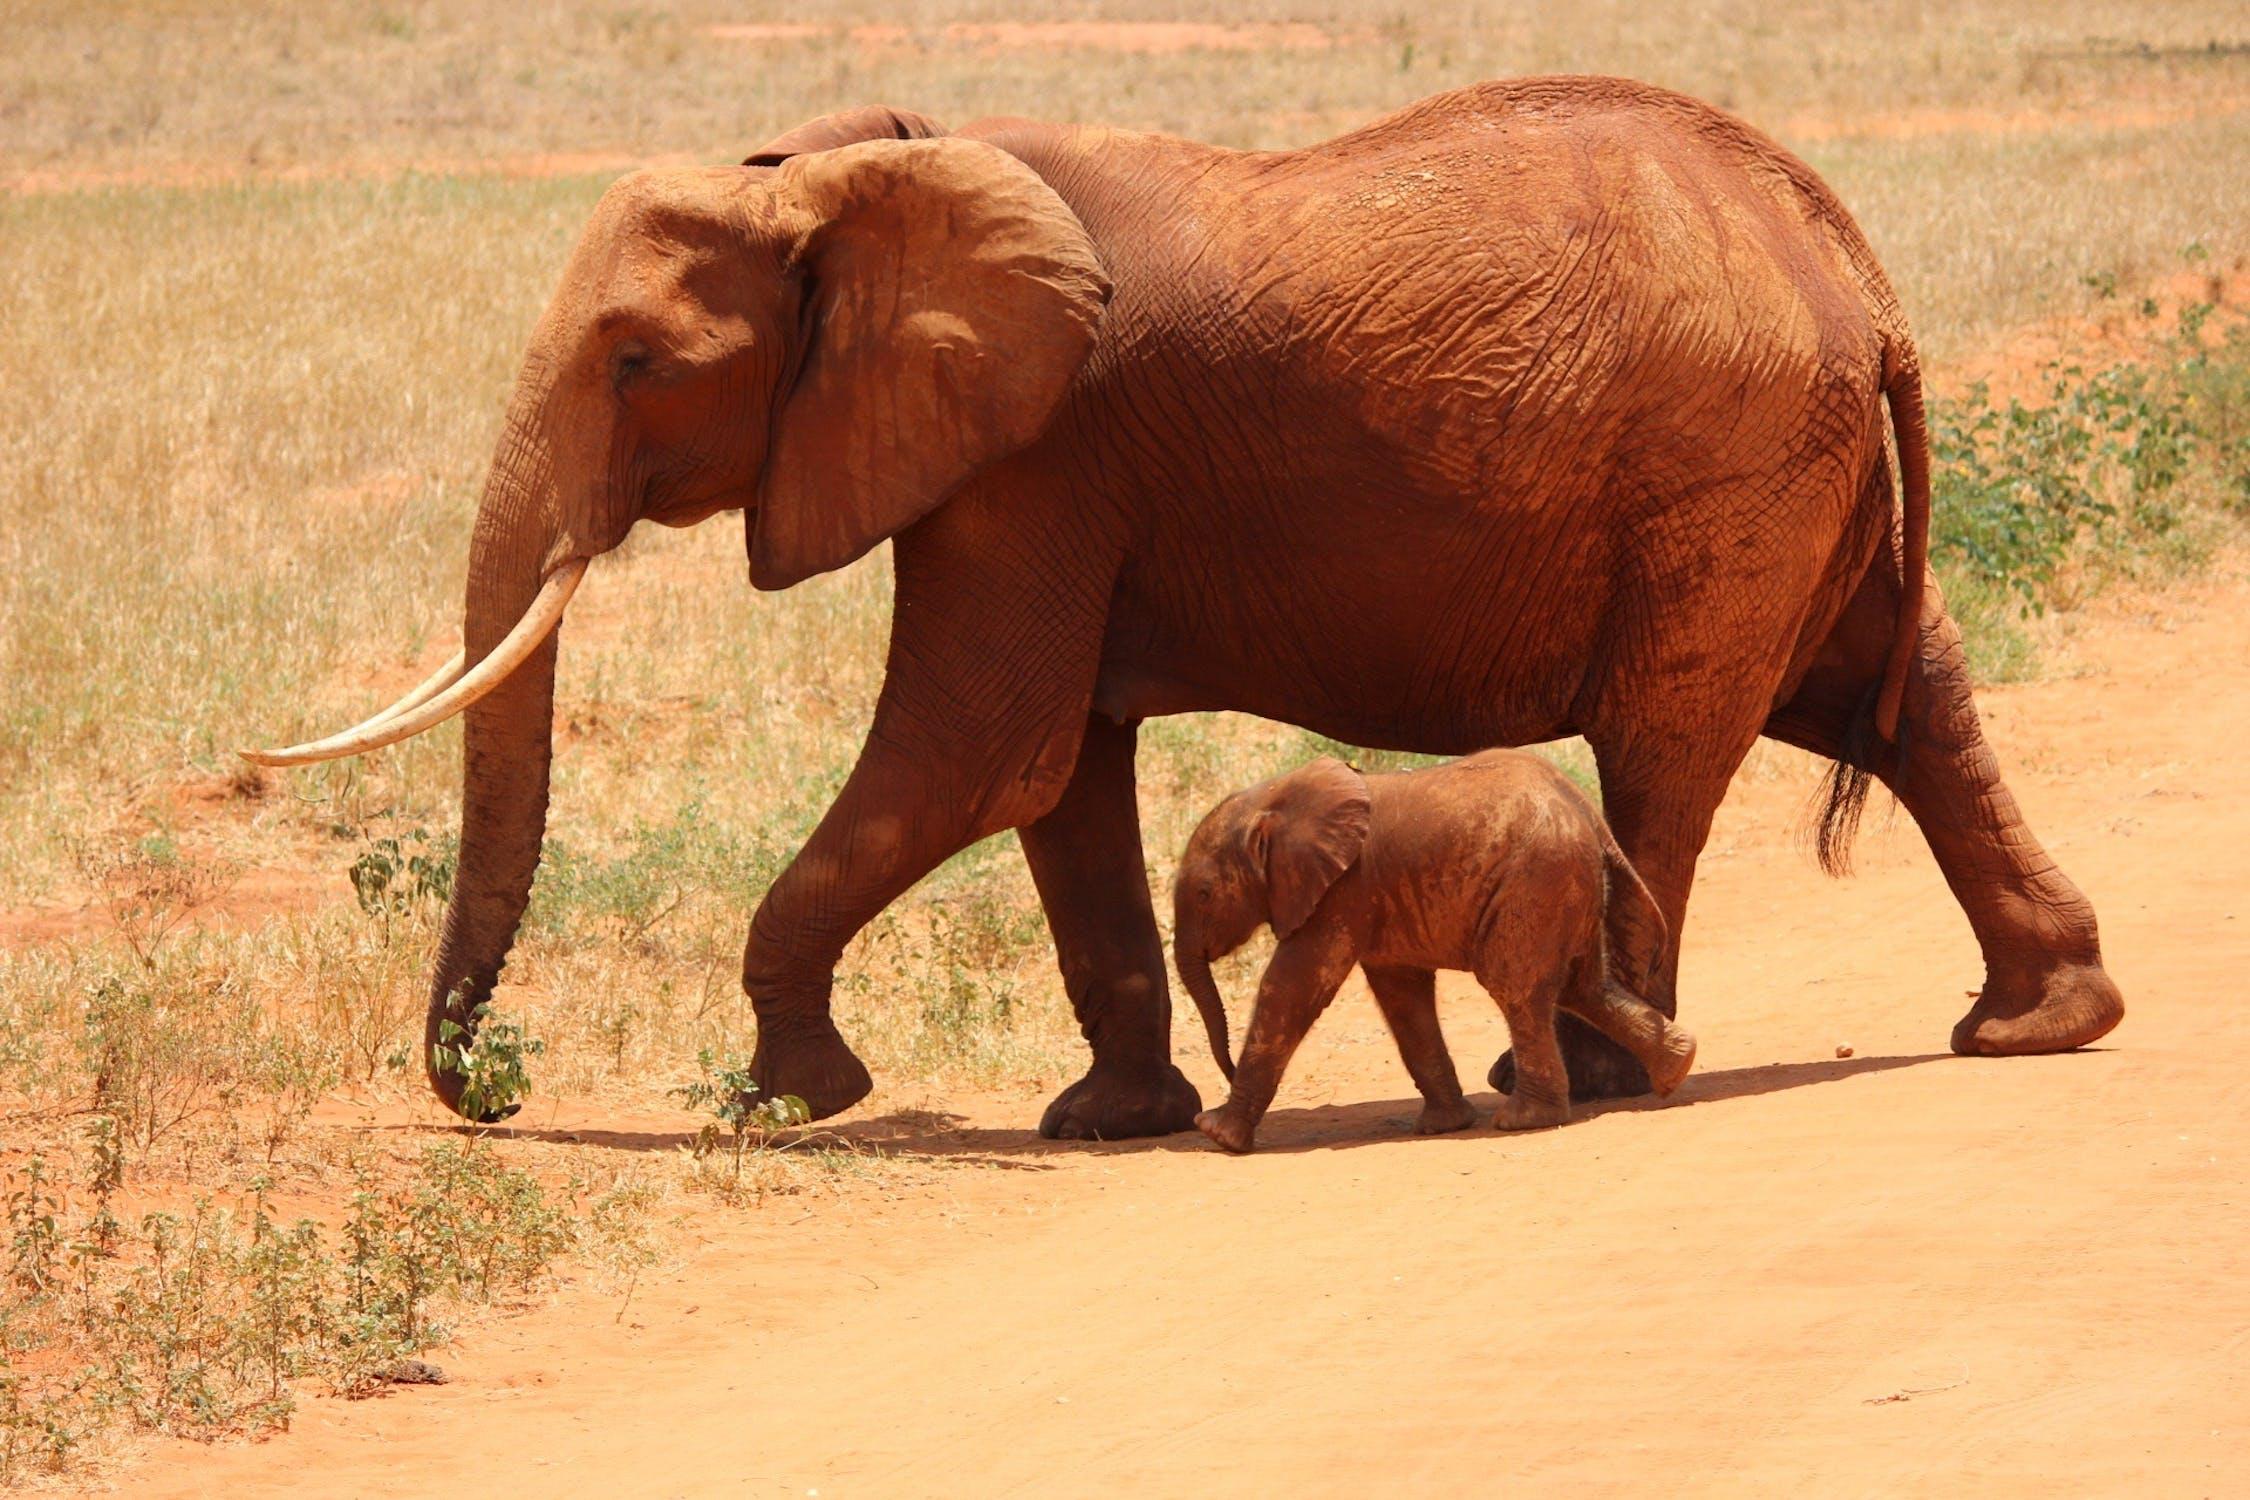 Kenya Begins First Ever Wildlife Census